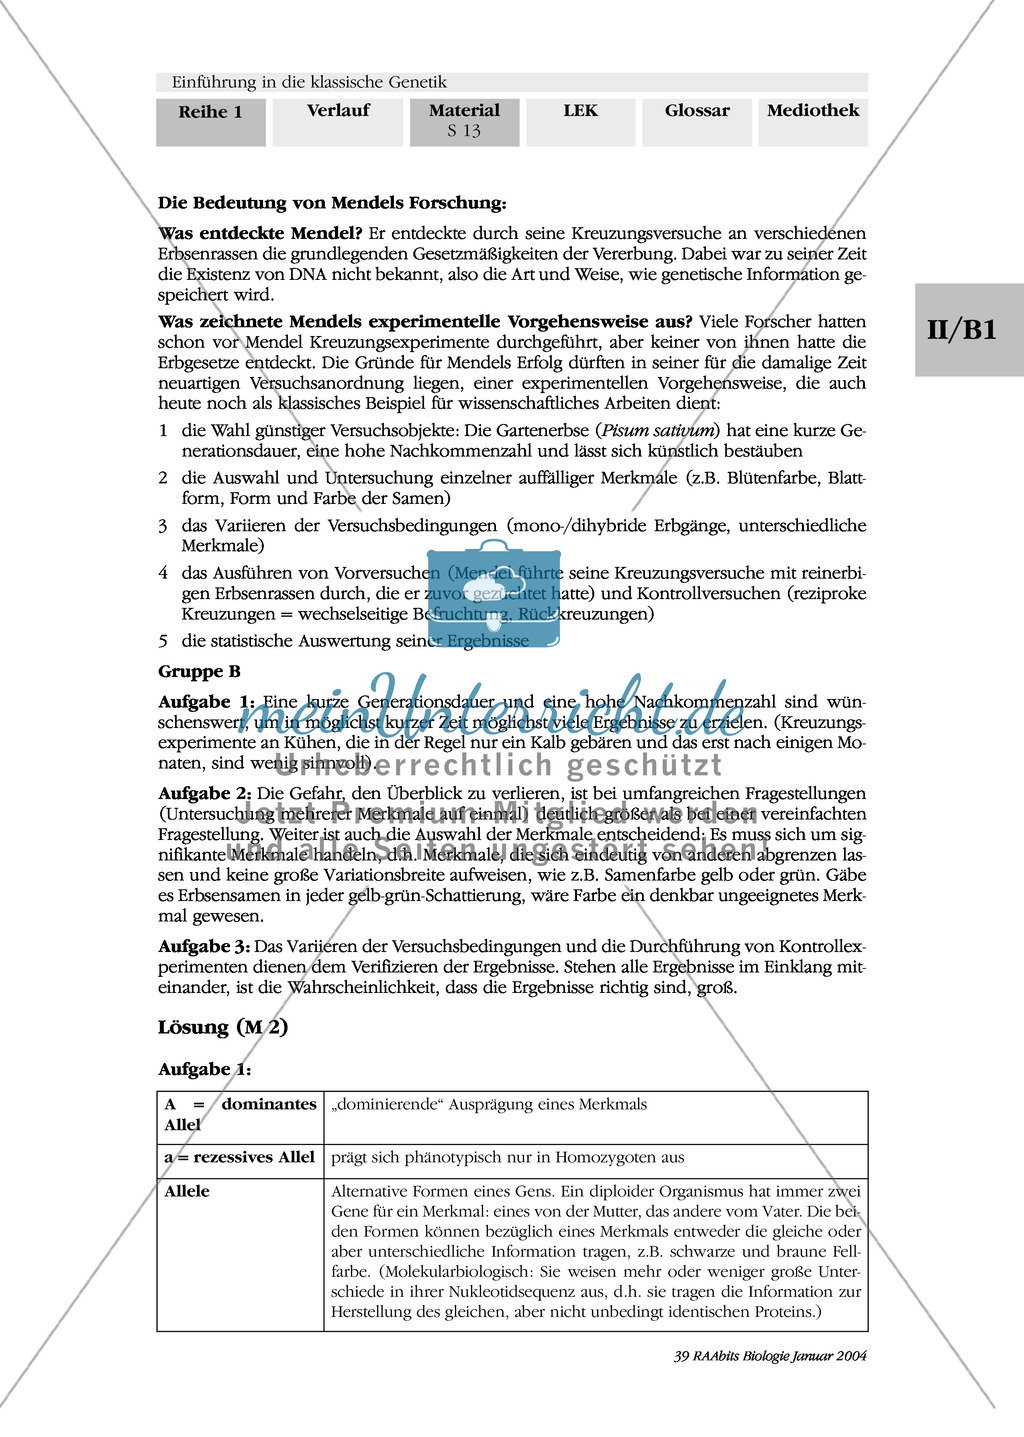 Klassische Genetik: Mendel`sche Regeln - Begriffe, Regeln, Kodominanz Preview 9